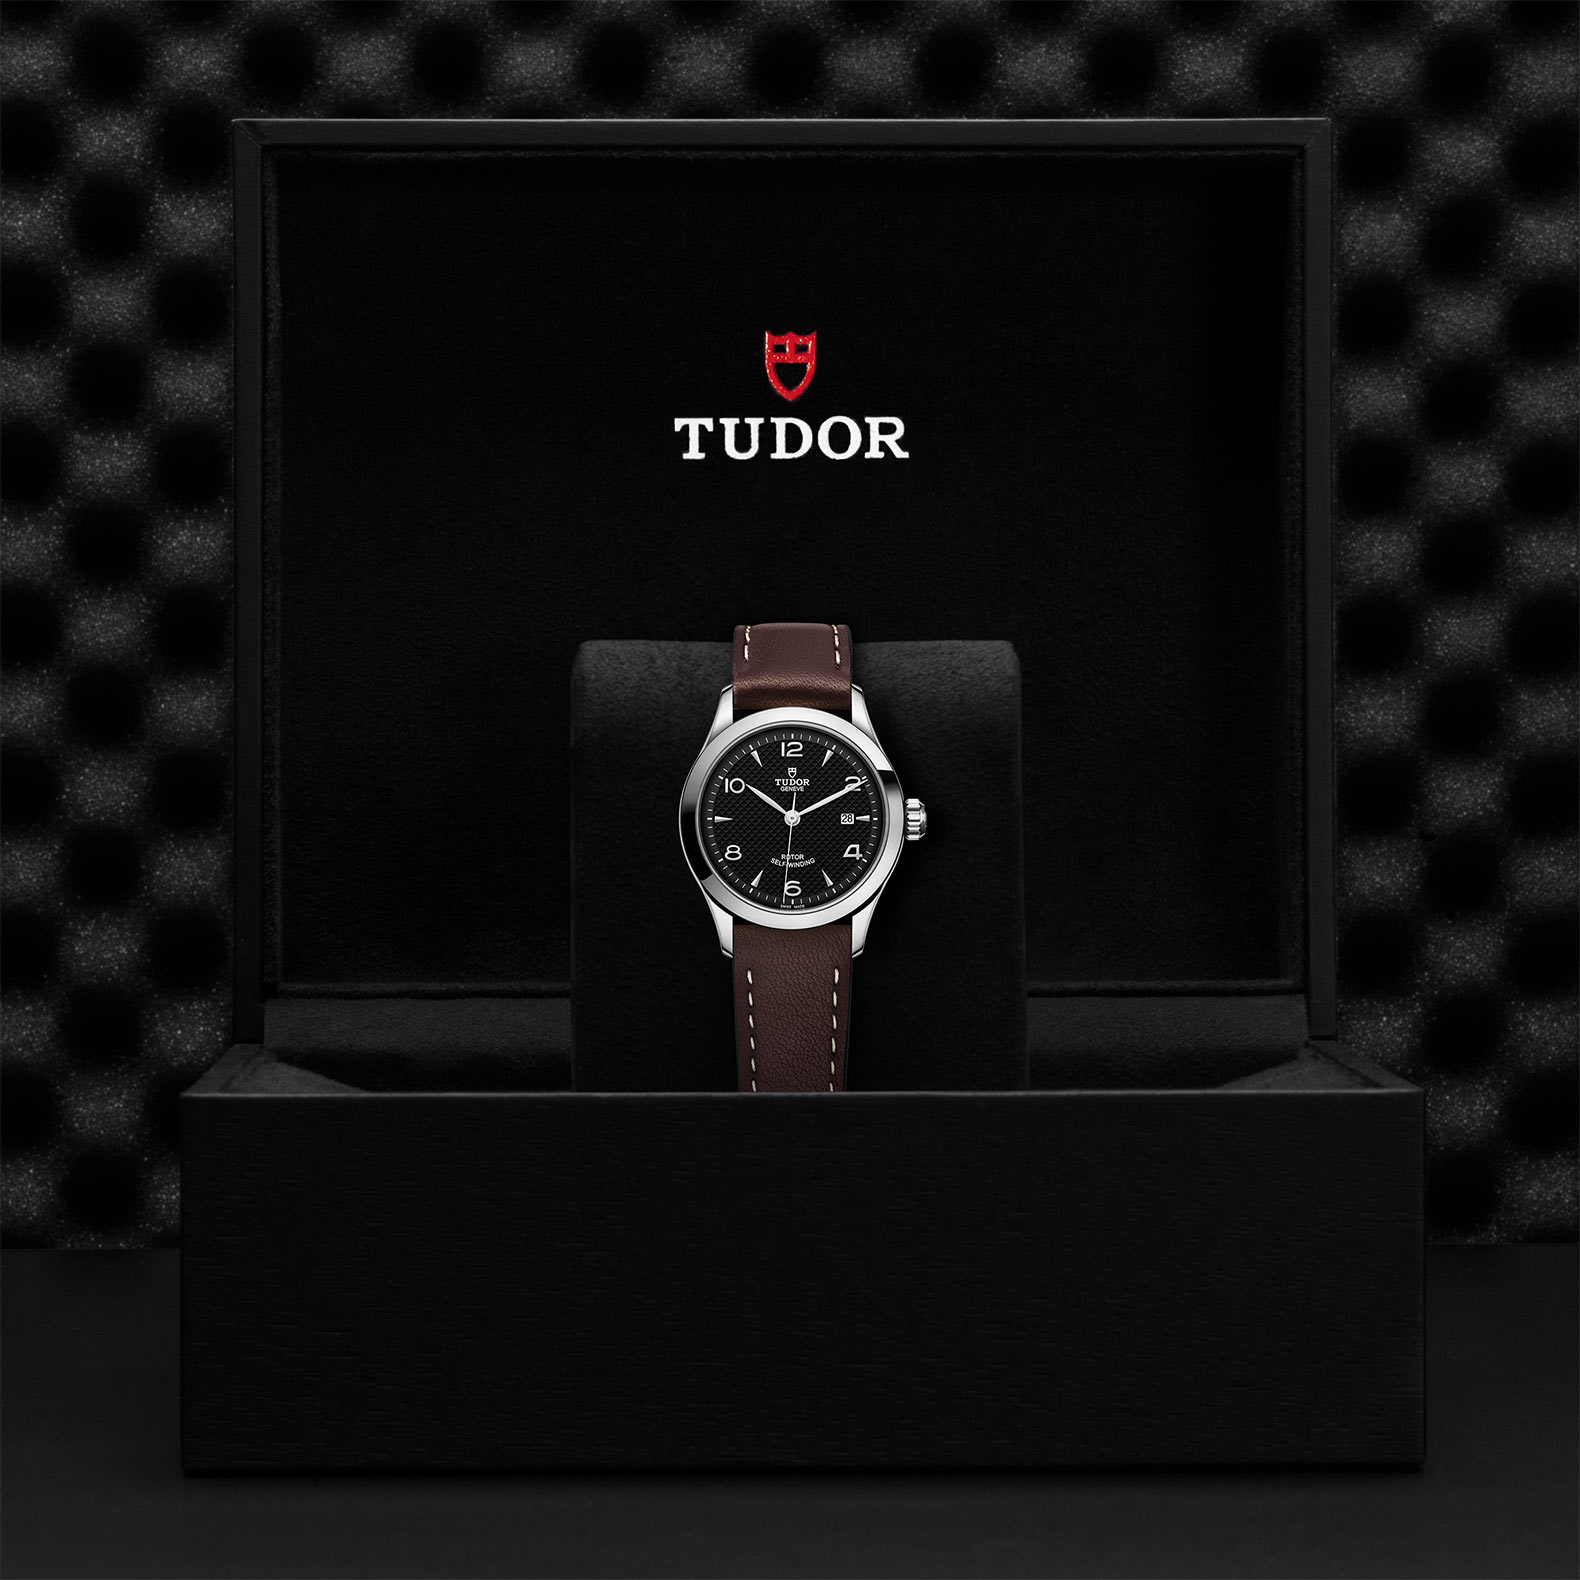 TUDOR 1926 - M91350-0008